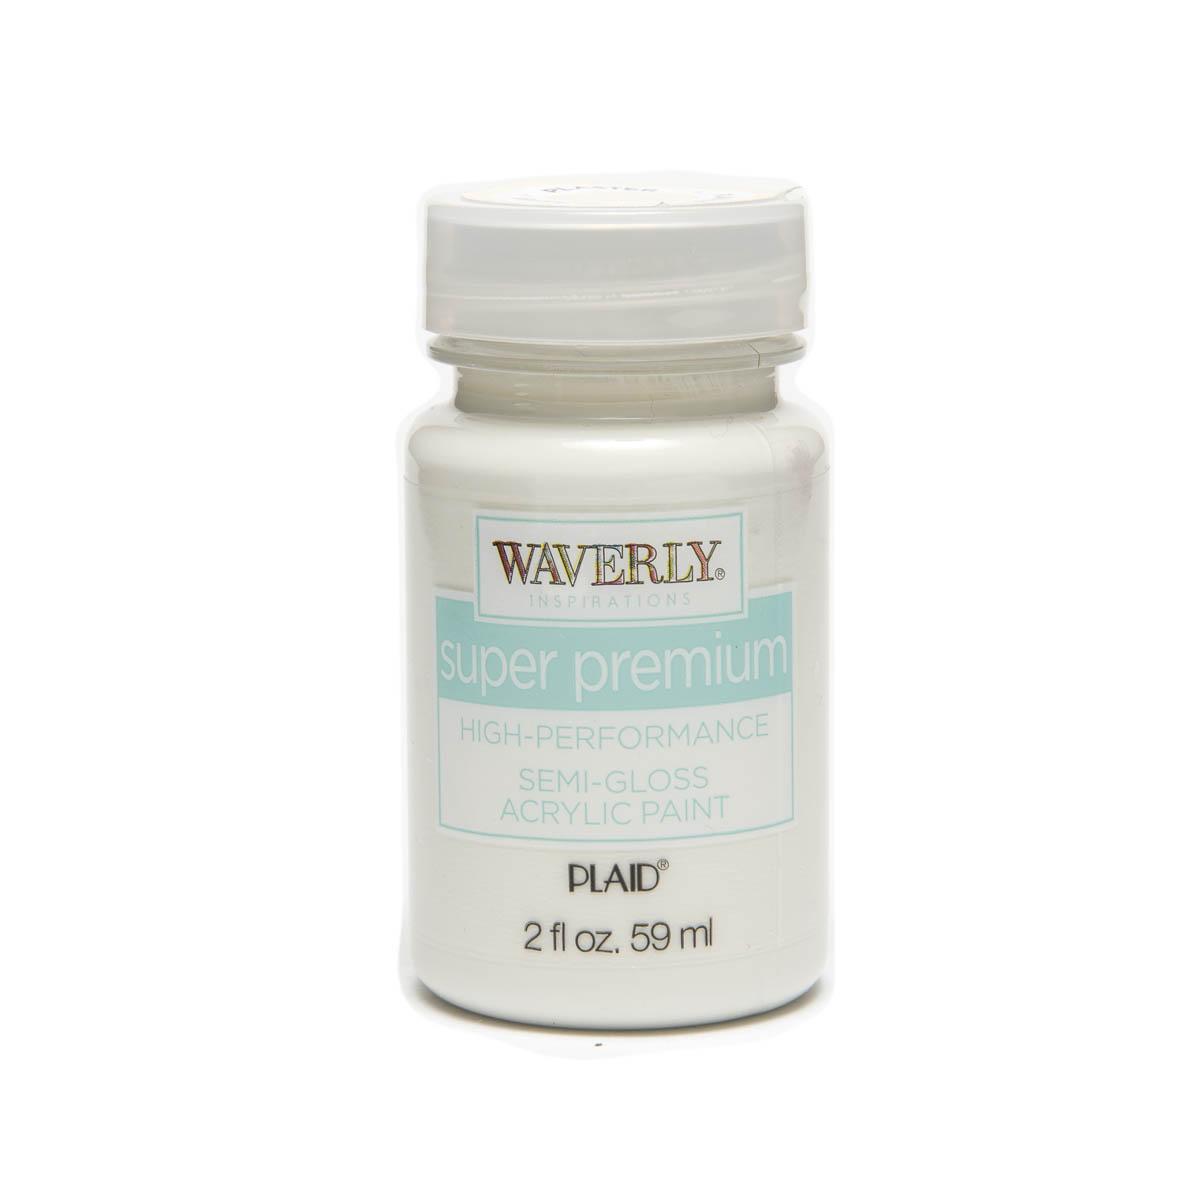 Waverly ® Inspirations Super Premium Semi-Gloss Acrylic Paint - Plaster, 2 oz.